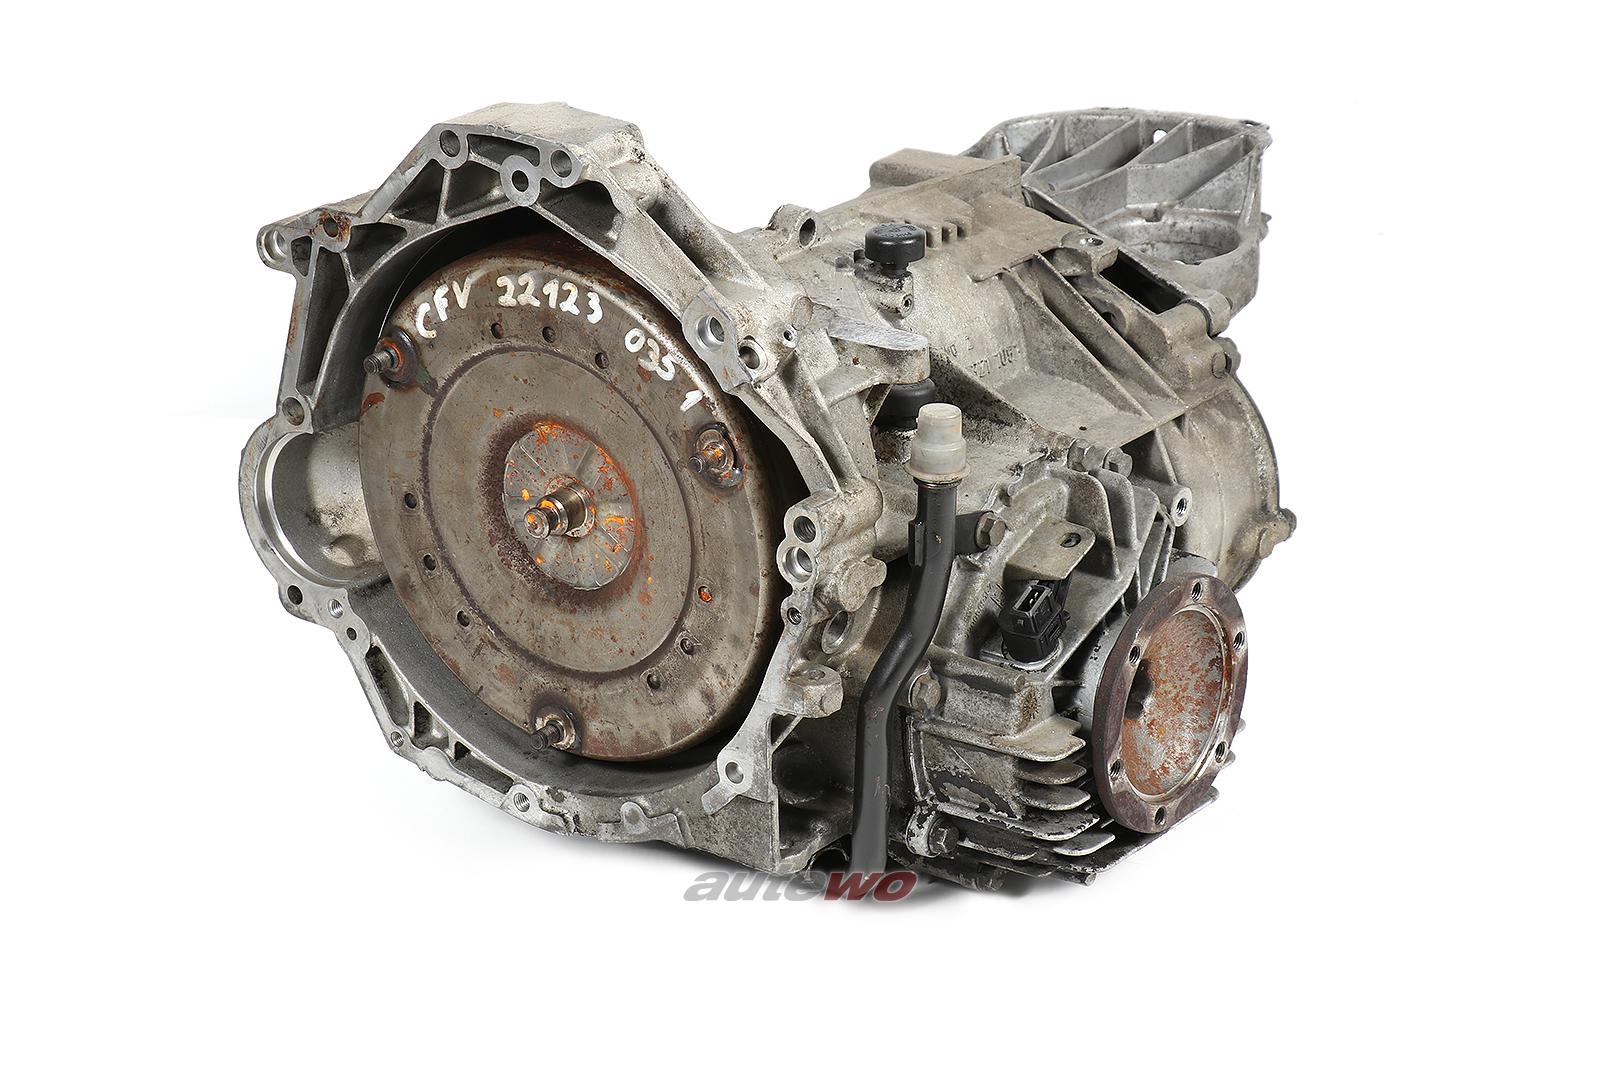 097300036LX Audi 80 B4/Coupe/Cabrio 2.8l V6 Automatikgetriebe CFV 22123 153500km